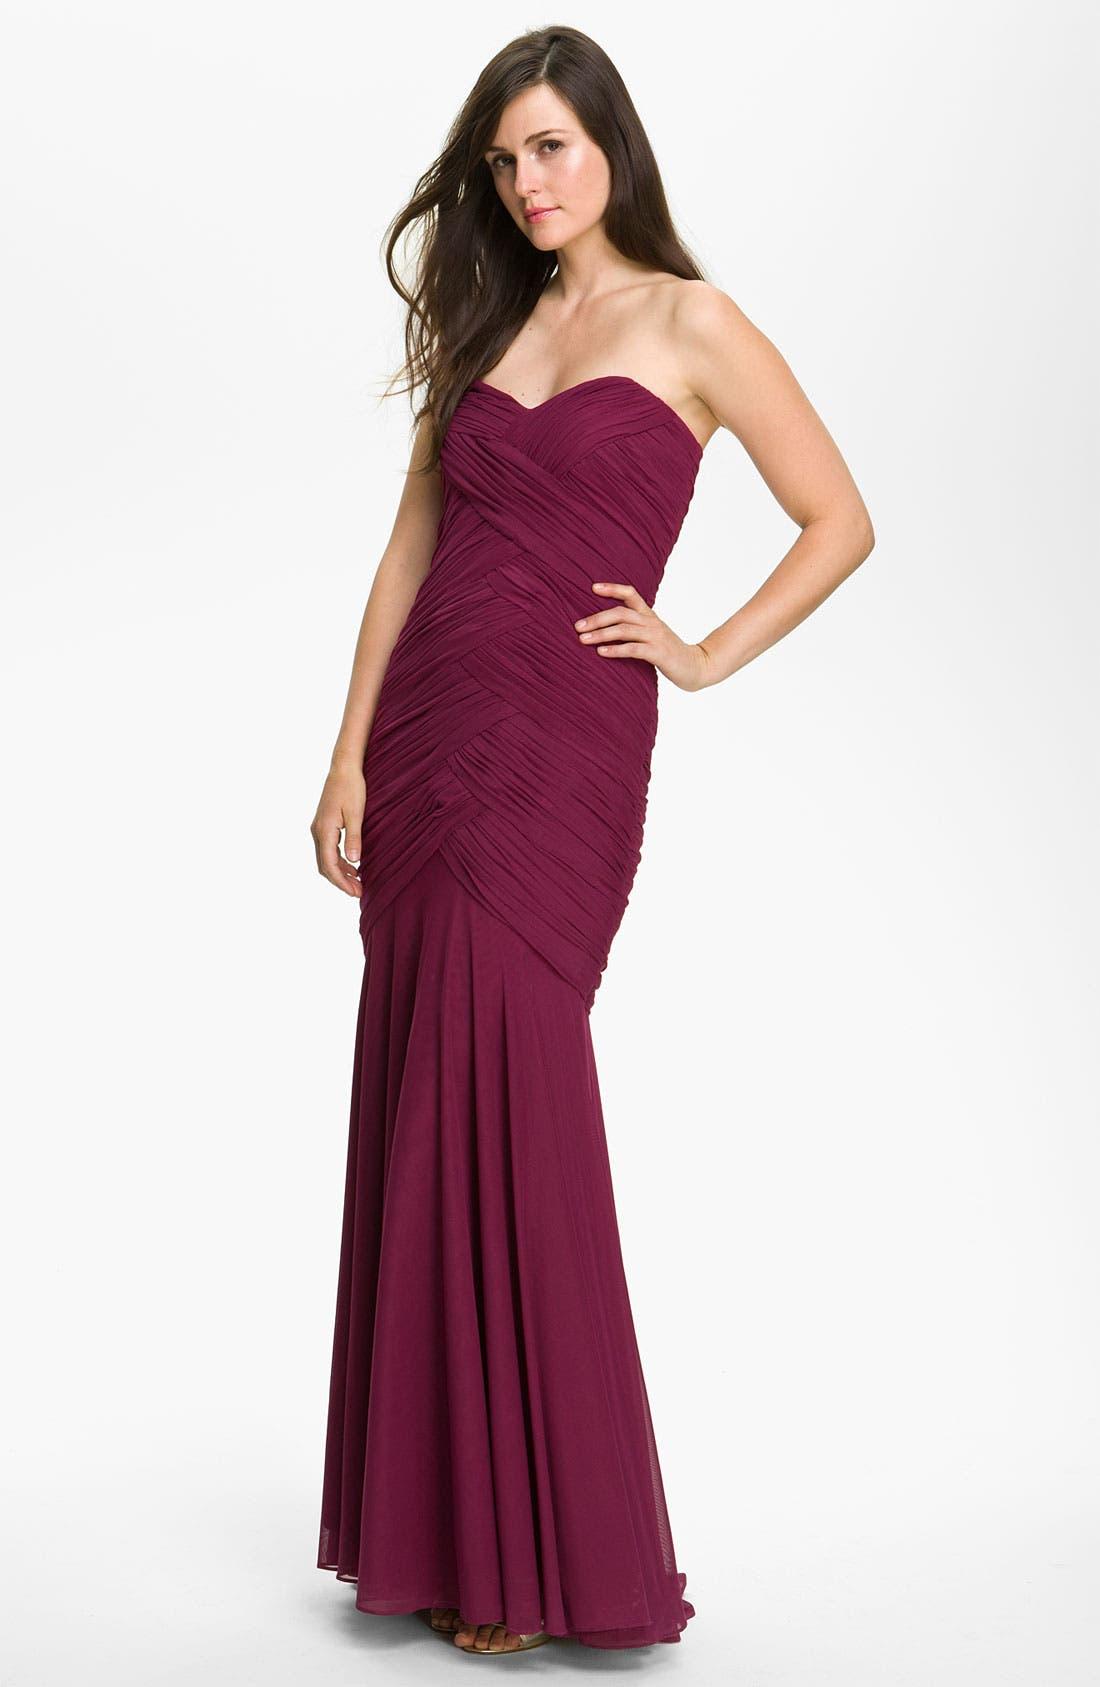 Alternate Image 1 Selected - Veni Infantino Weave Detail Mesh Fishtail Gown & Bolero